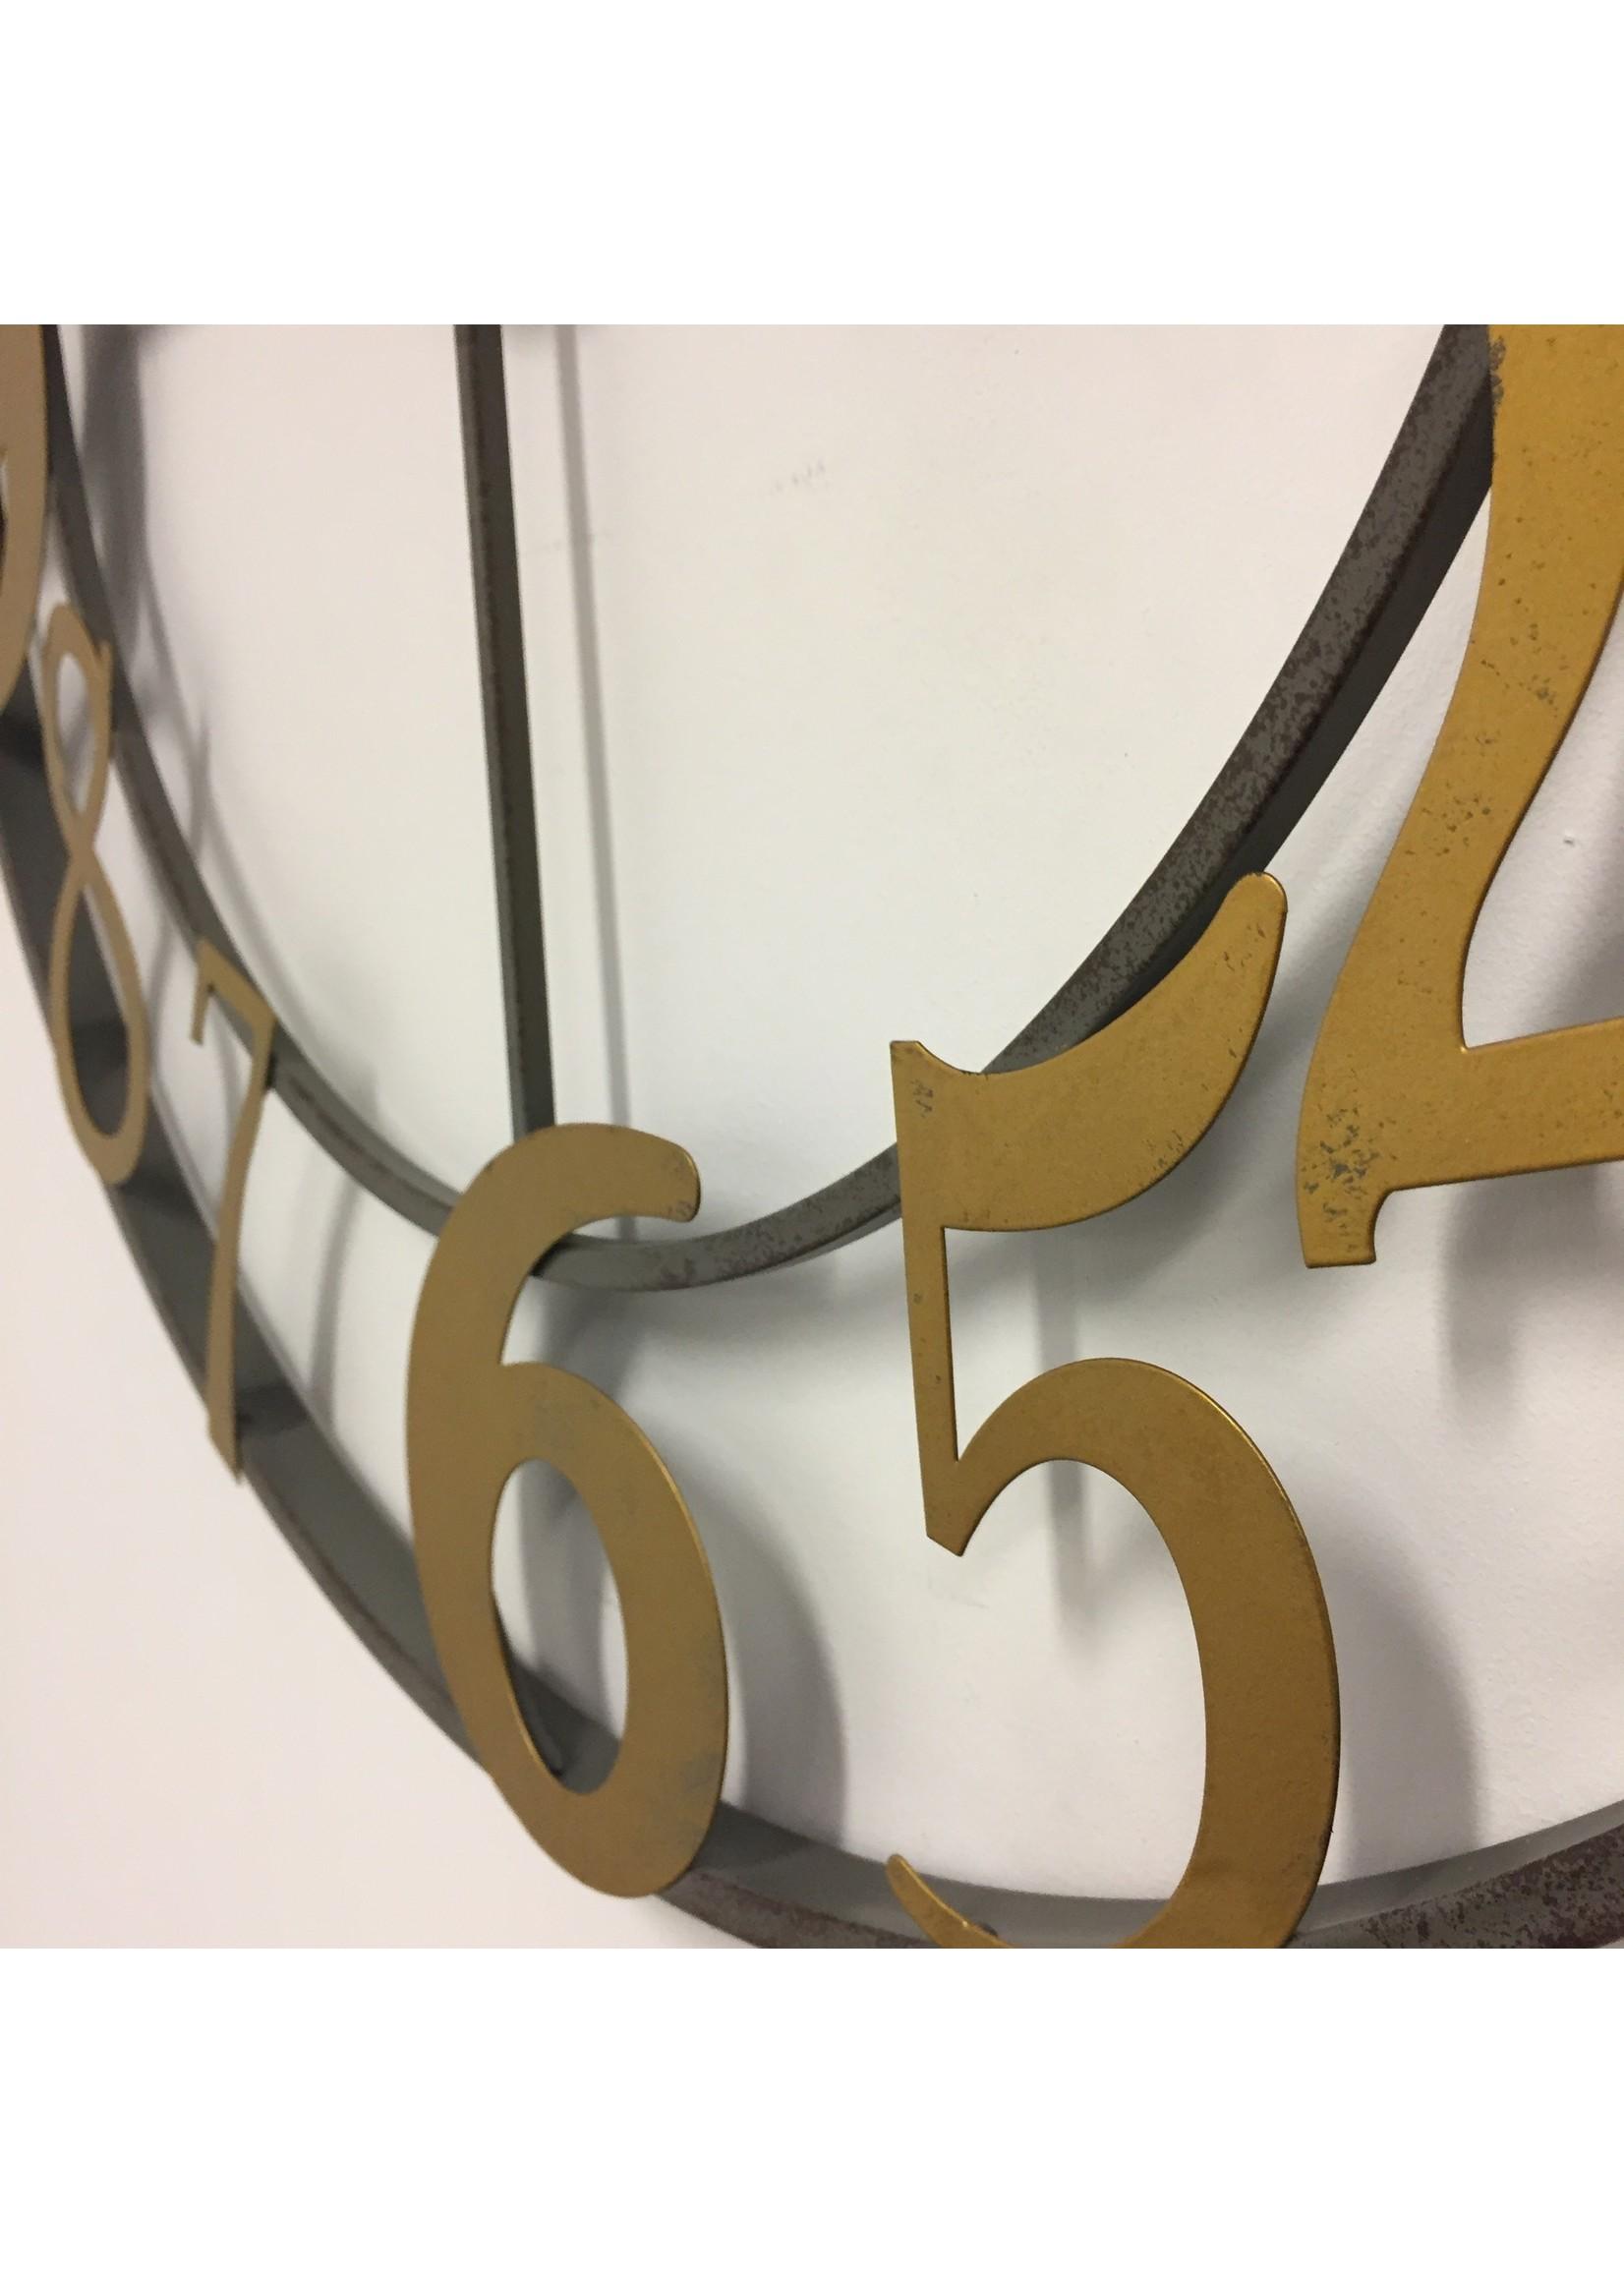 Klokkendiscounter Wandklok Gold Rush Industrieel Design RETRO